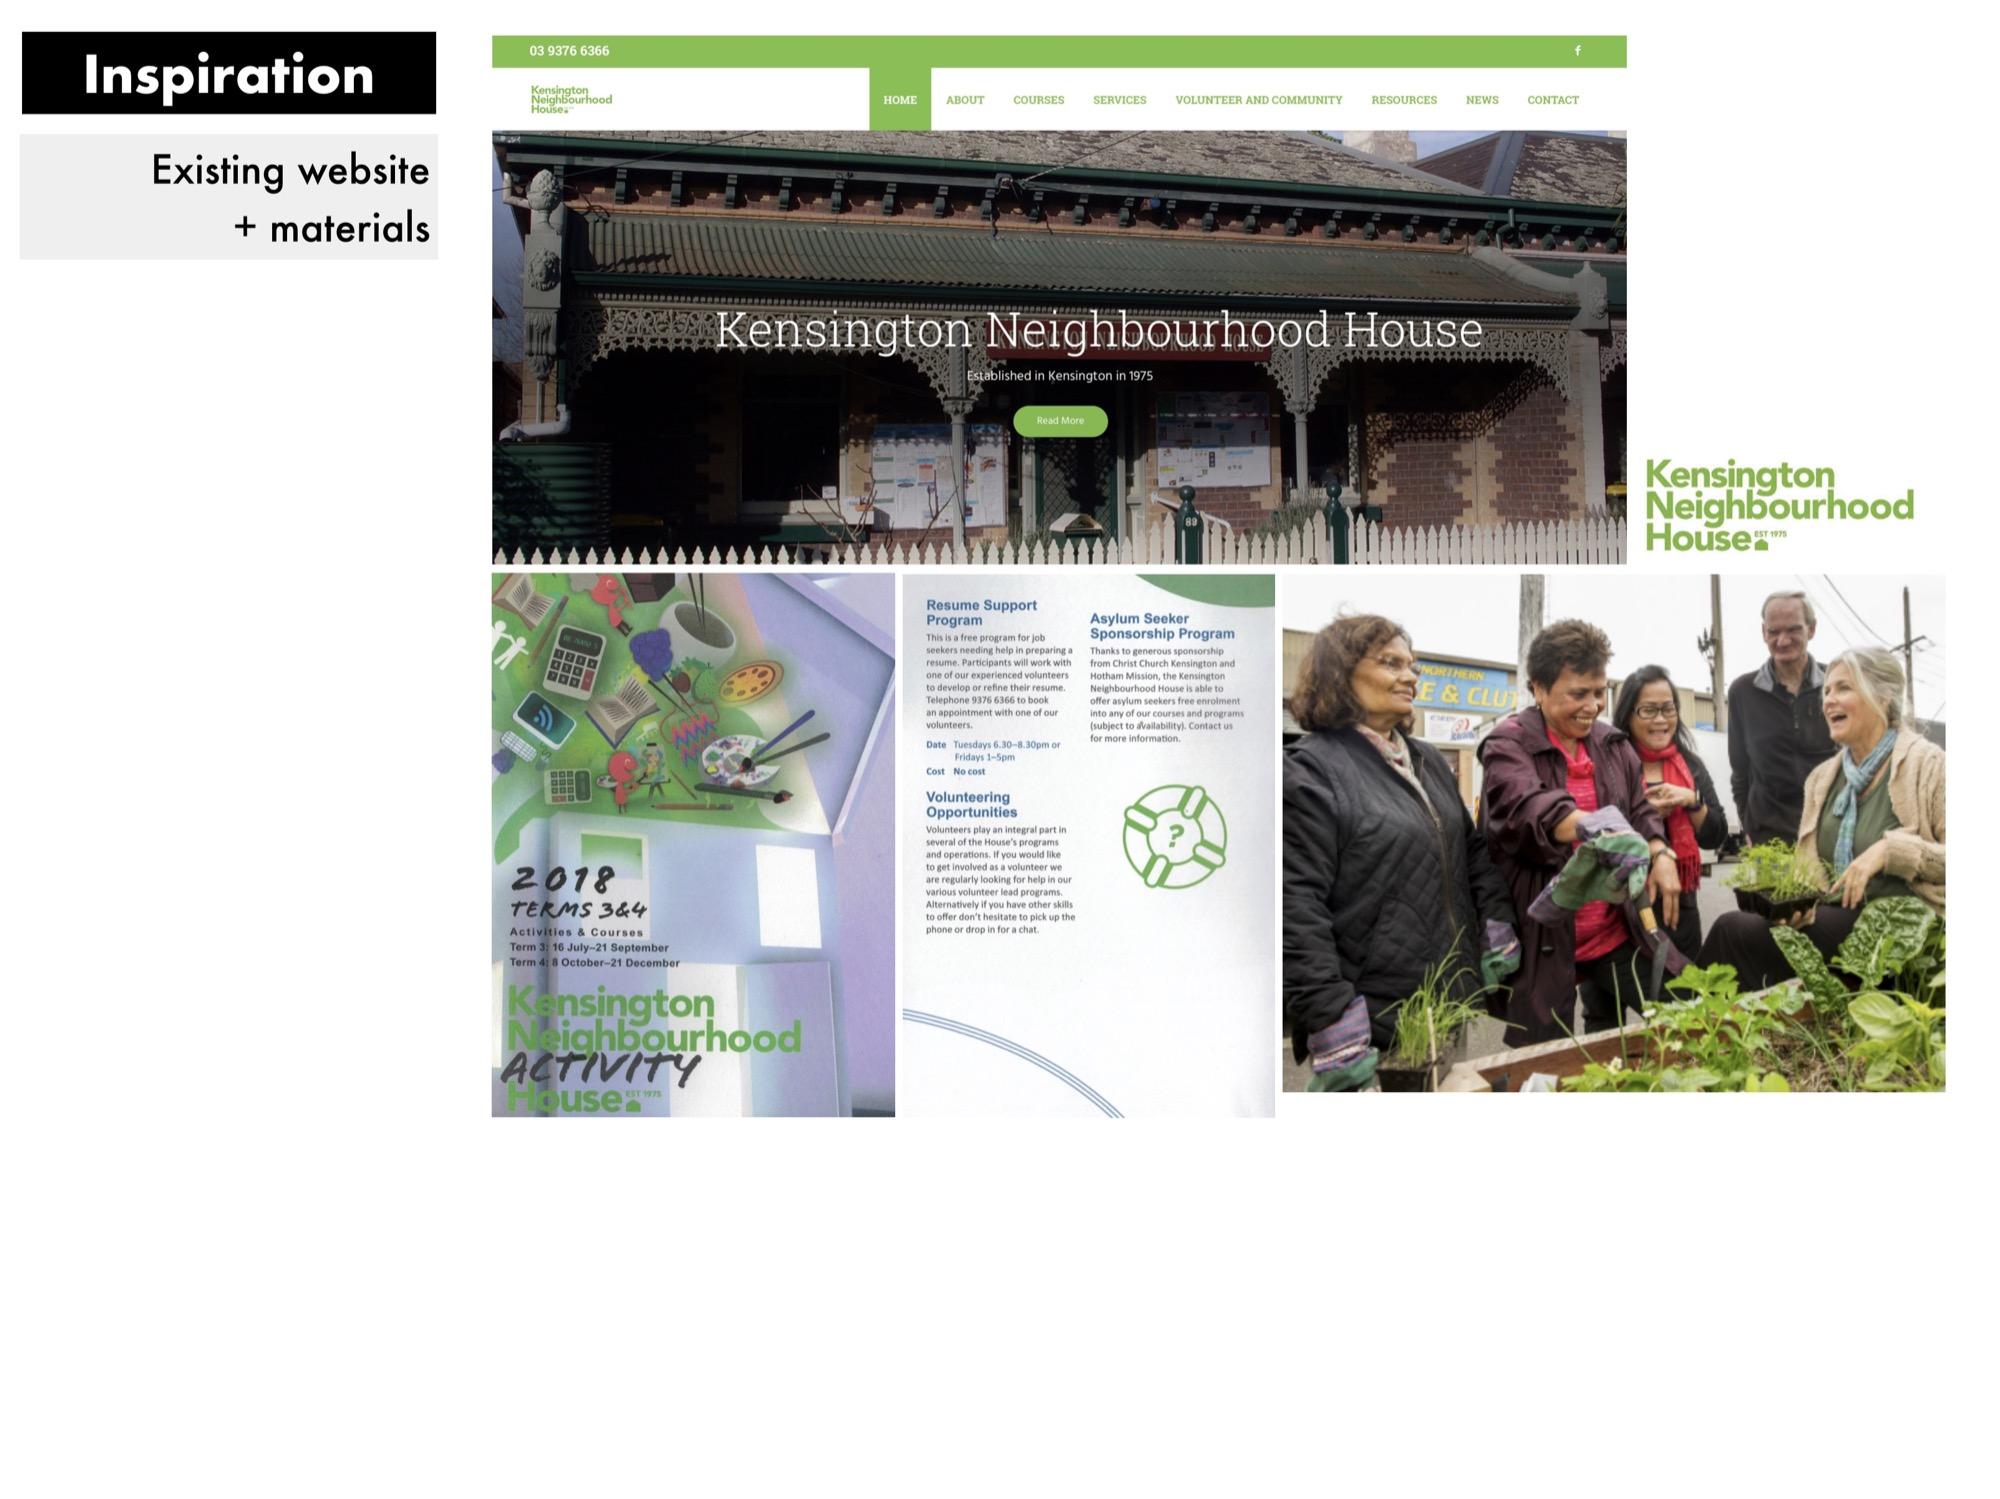 kenhouse_webdesign1.jpg